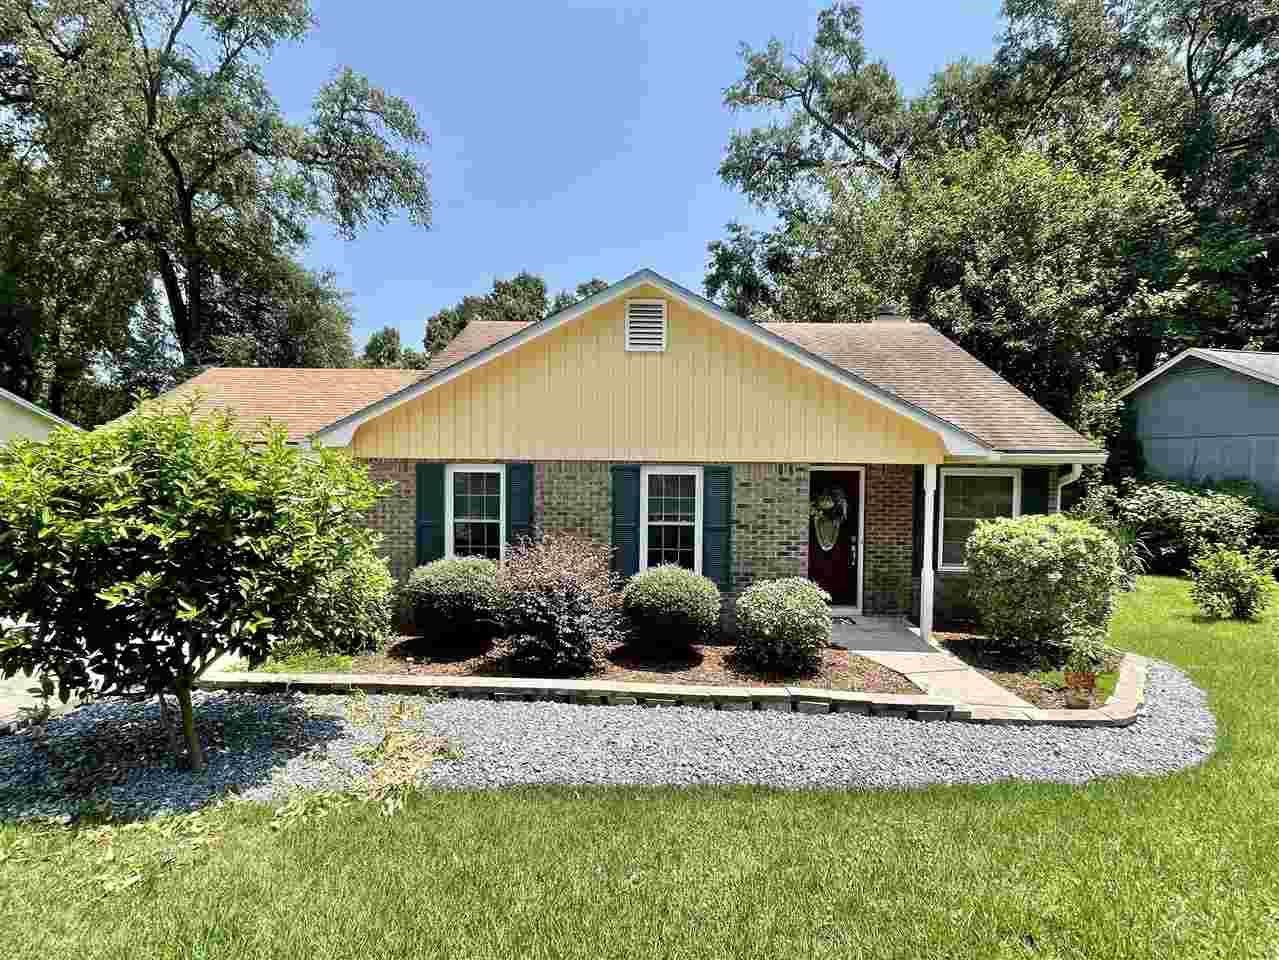 Photo of 1496 Bent Willow Drive, TALLAHASSEE, FL 32311 (MLS # 335338)